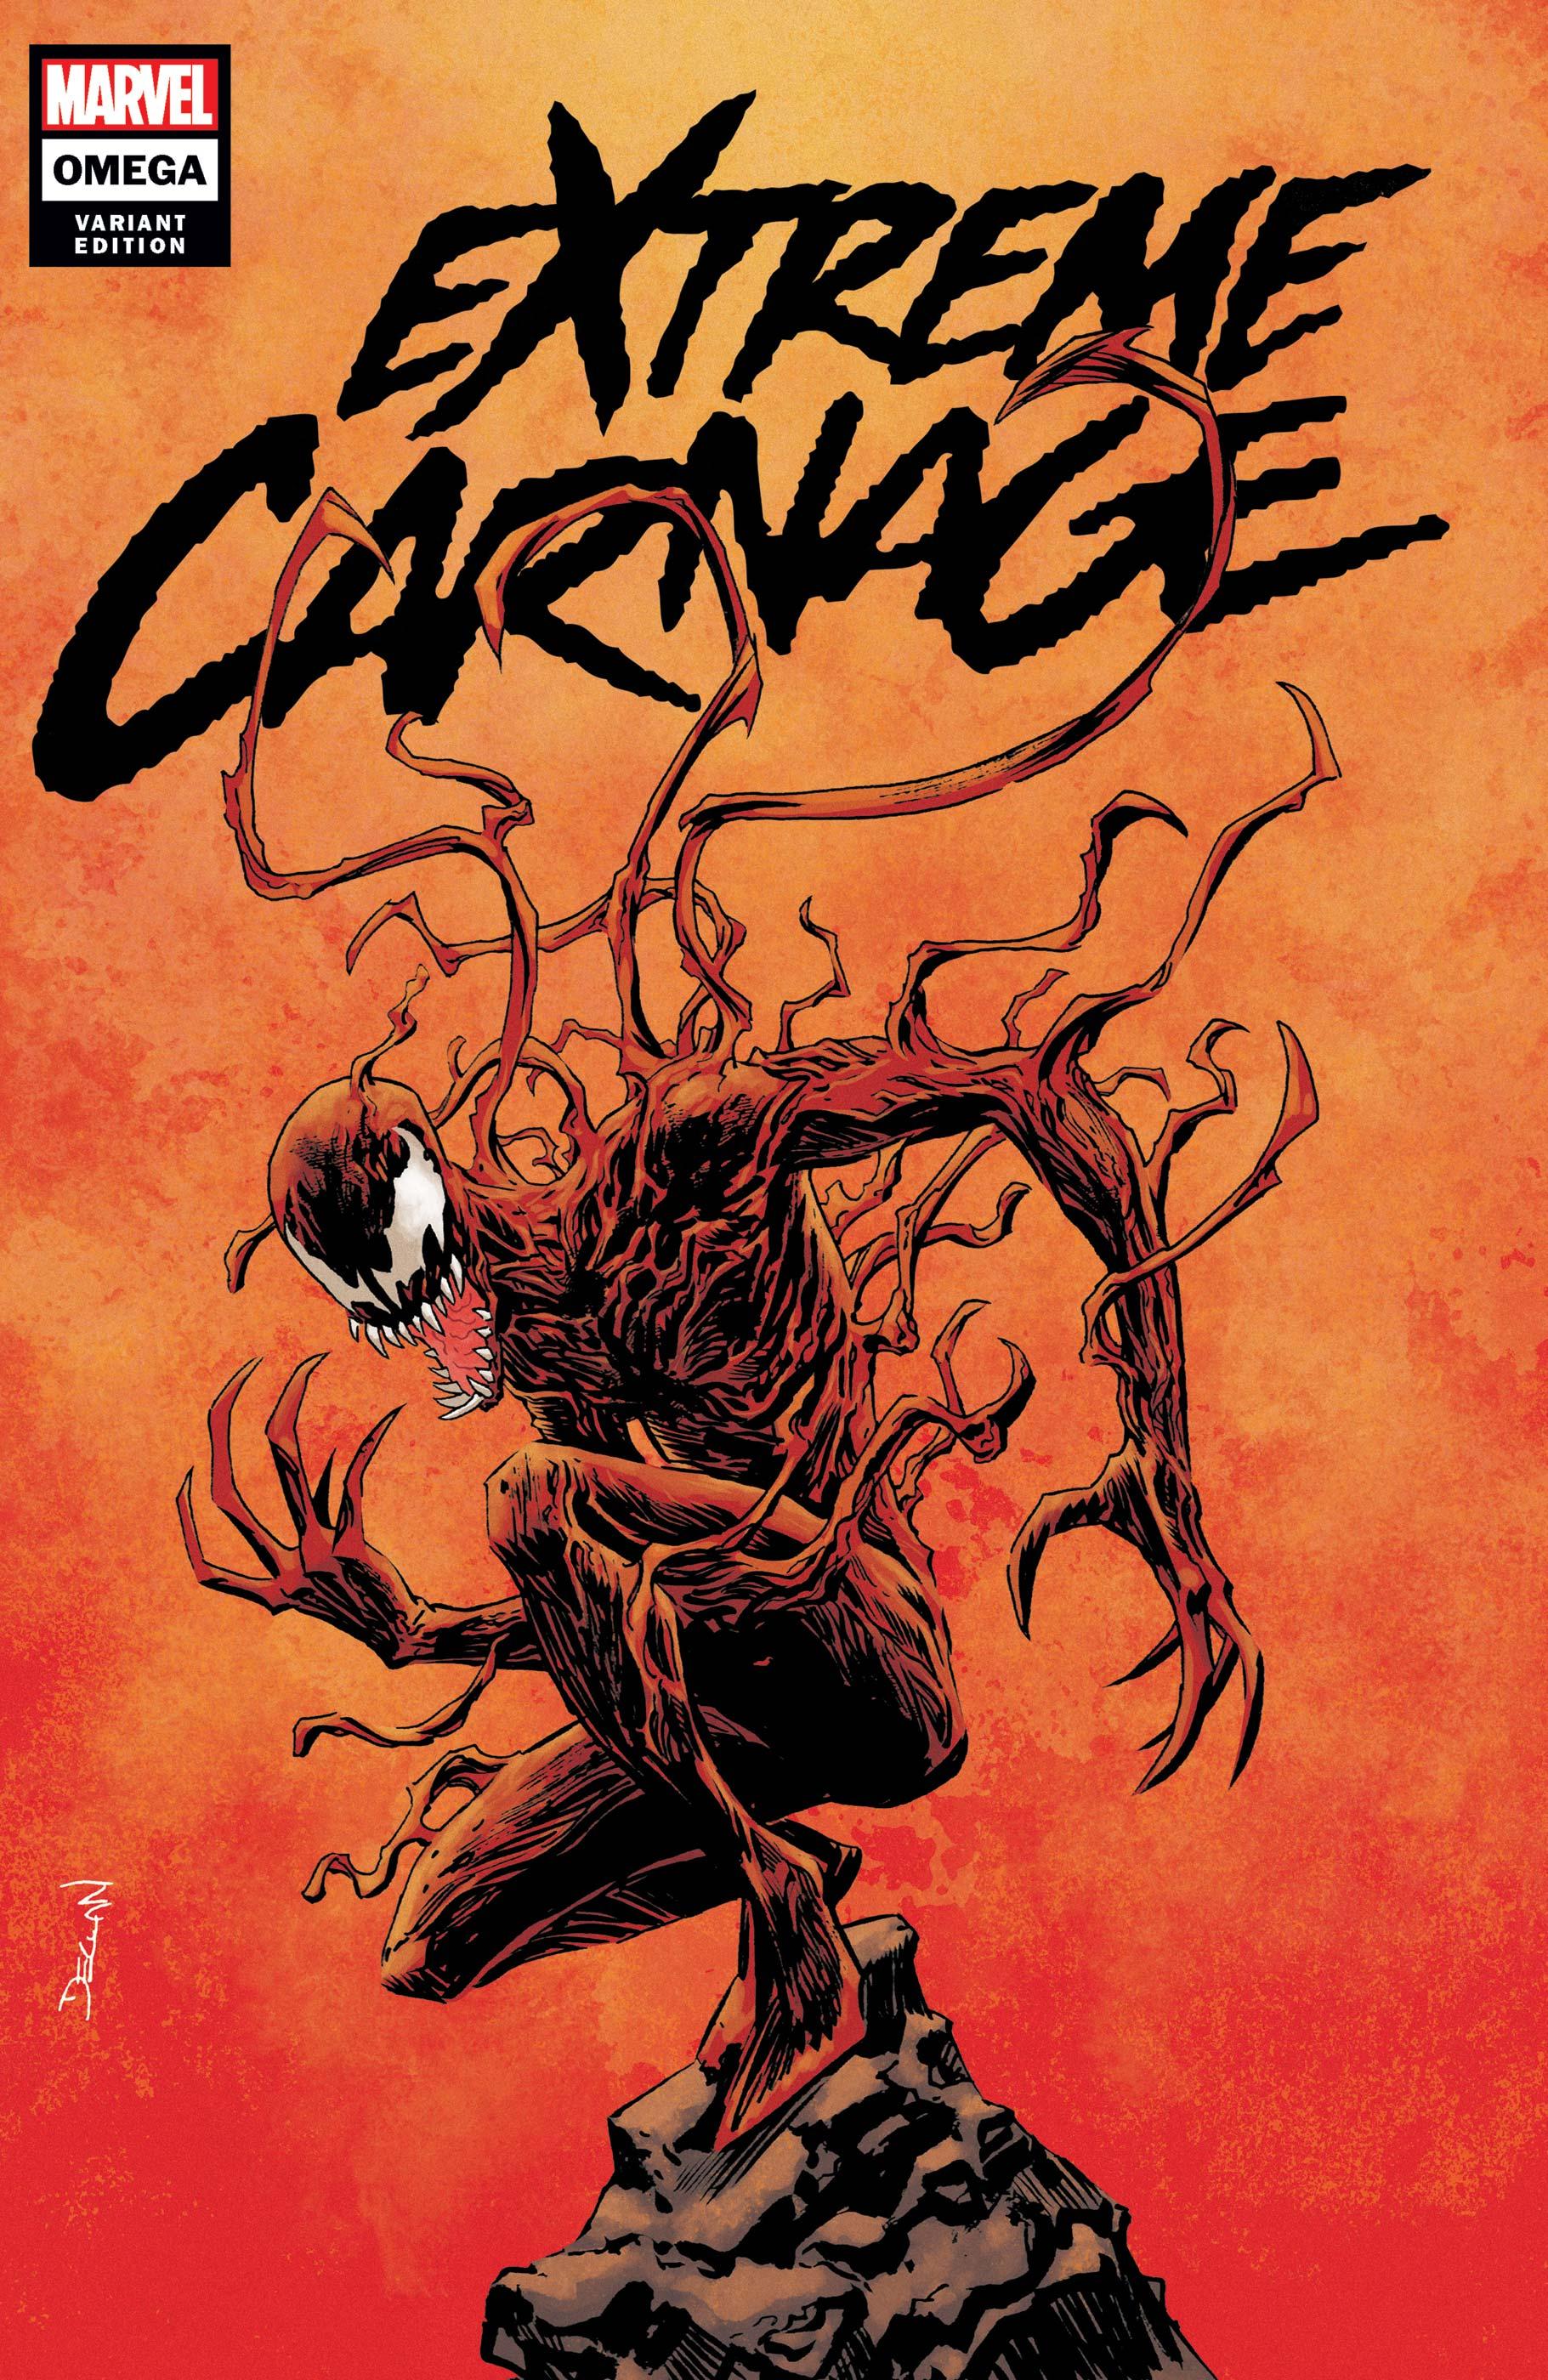 Extreme Carnage Omega (2021) #1 (Variant)